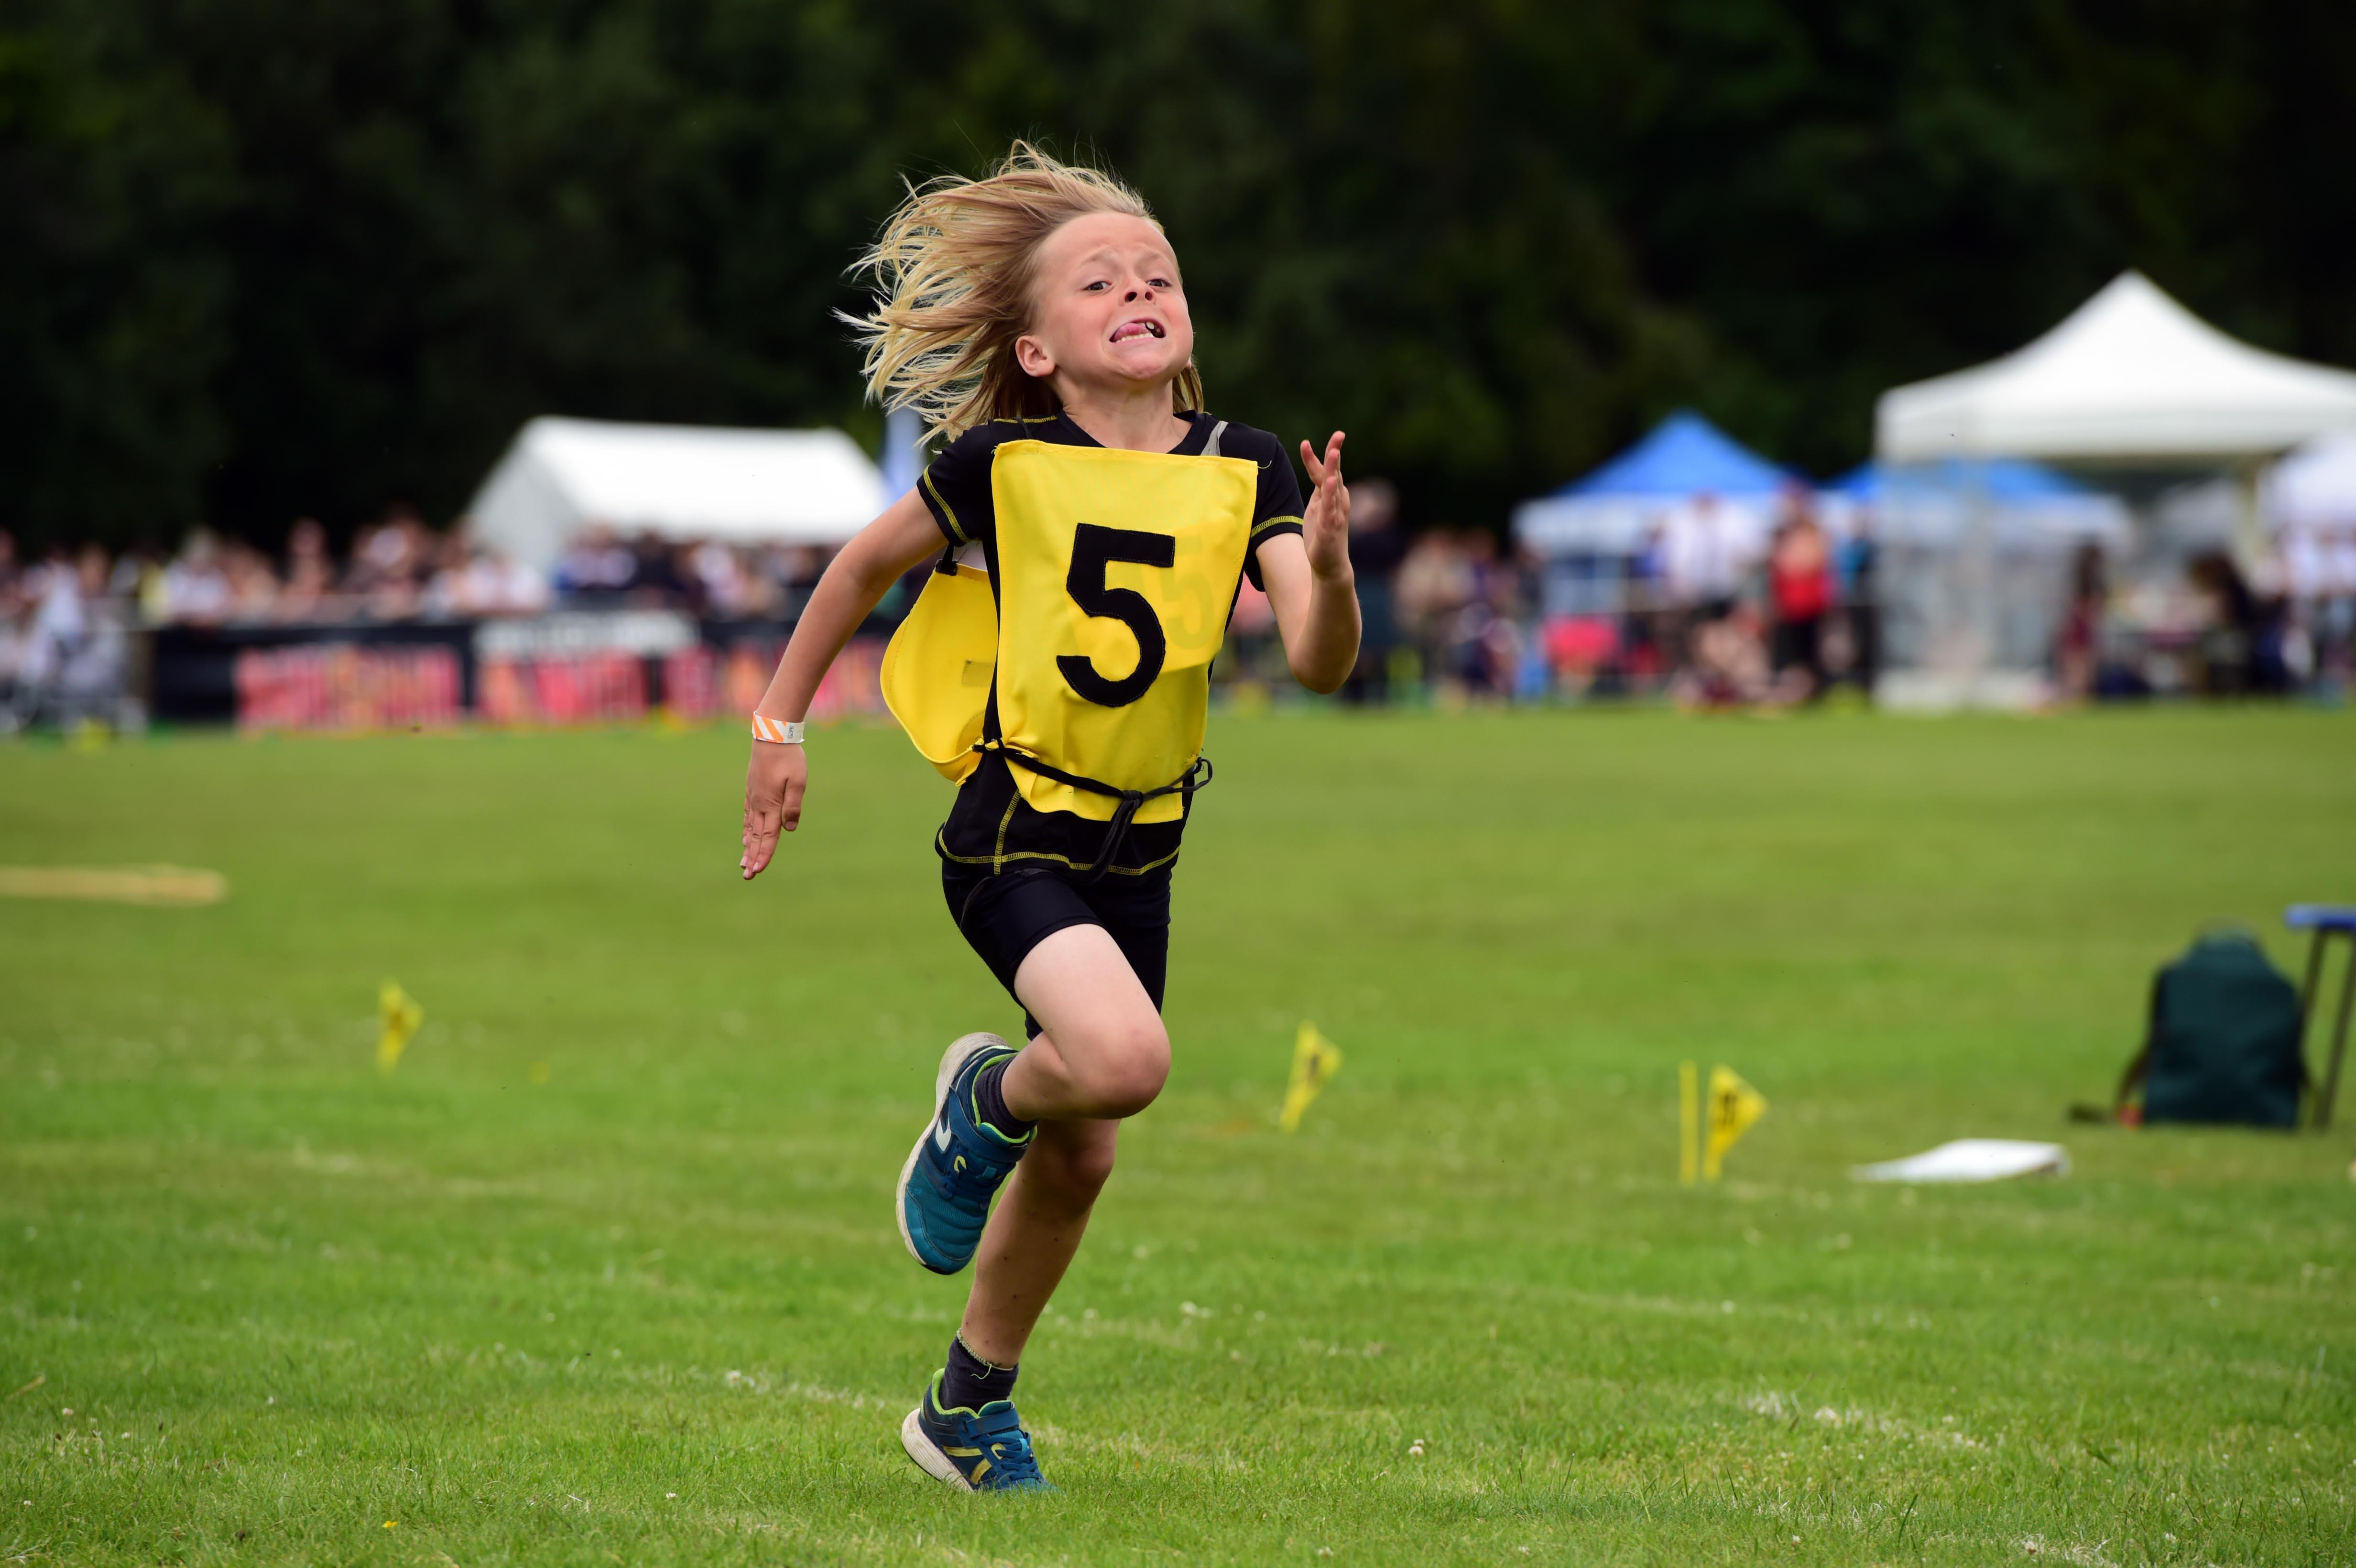 SPORTS WEEK: Sporting heroes back Scottish Women and Girls in Sport Week